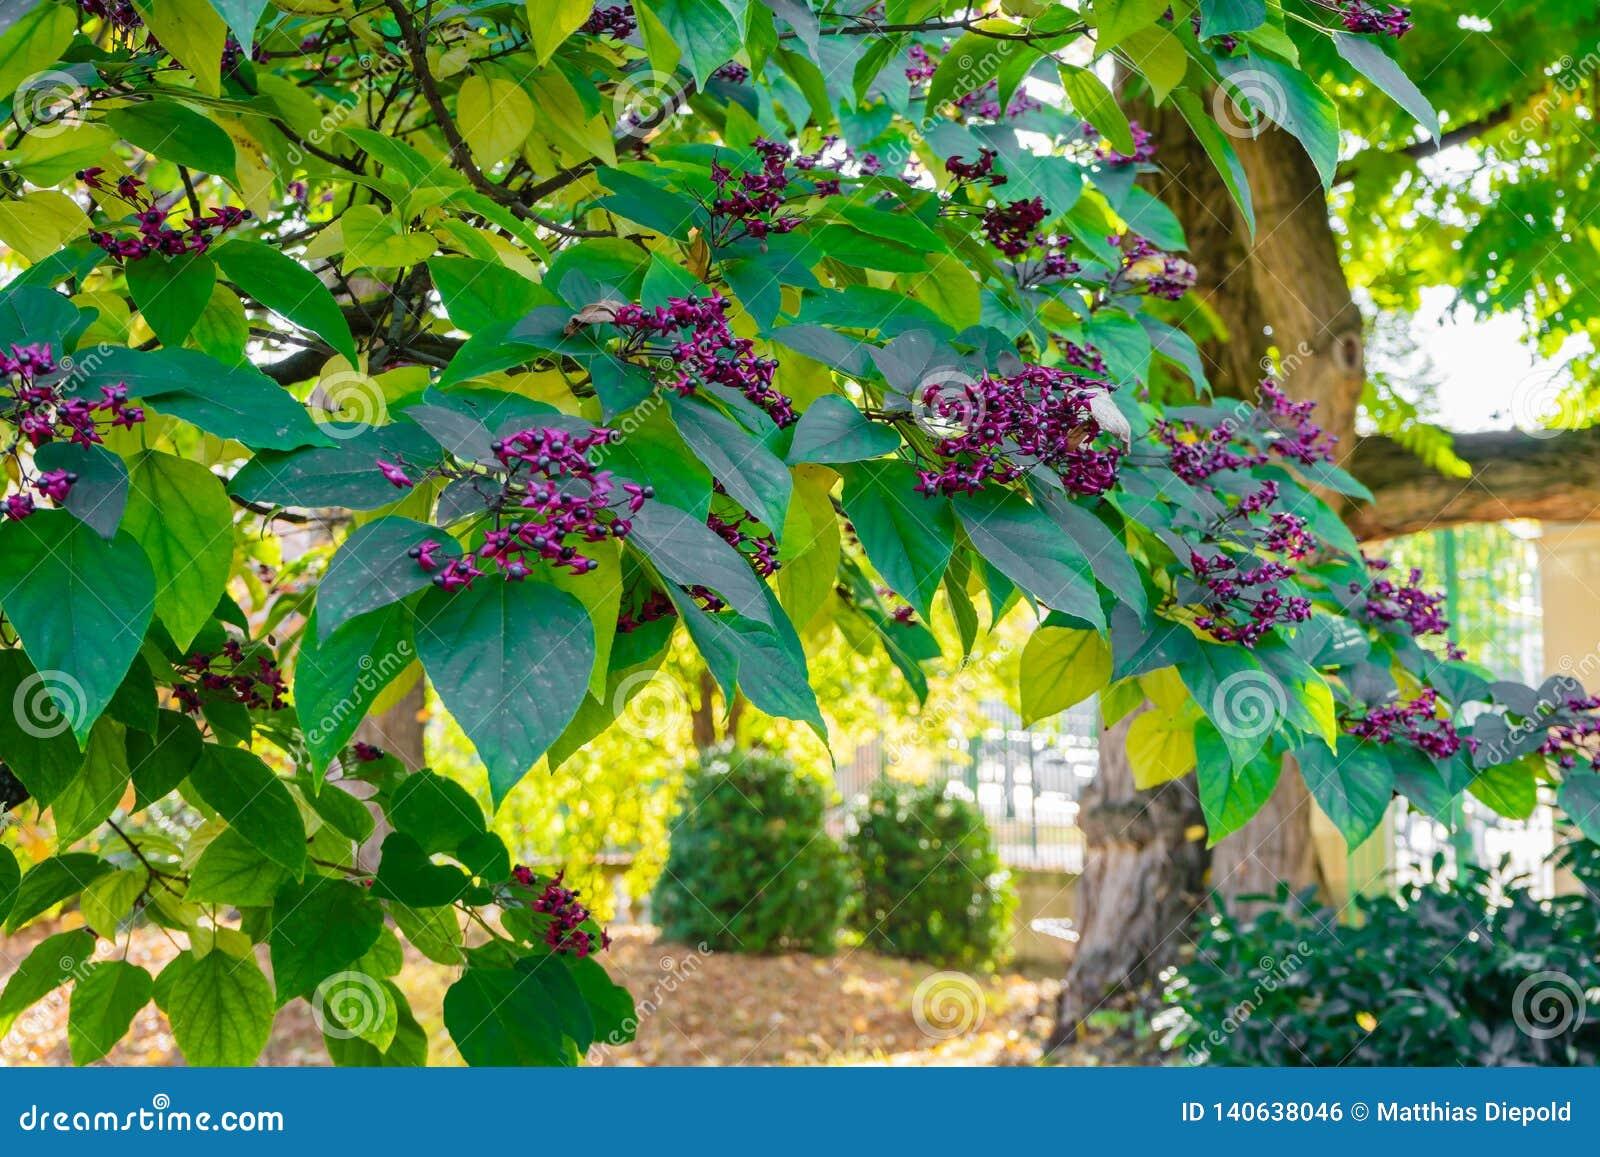 Árvore indiana do beutifull da raiz da seta